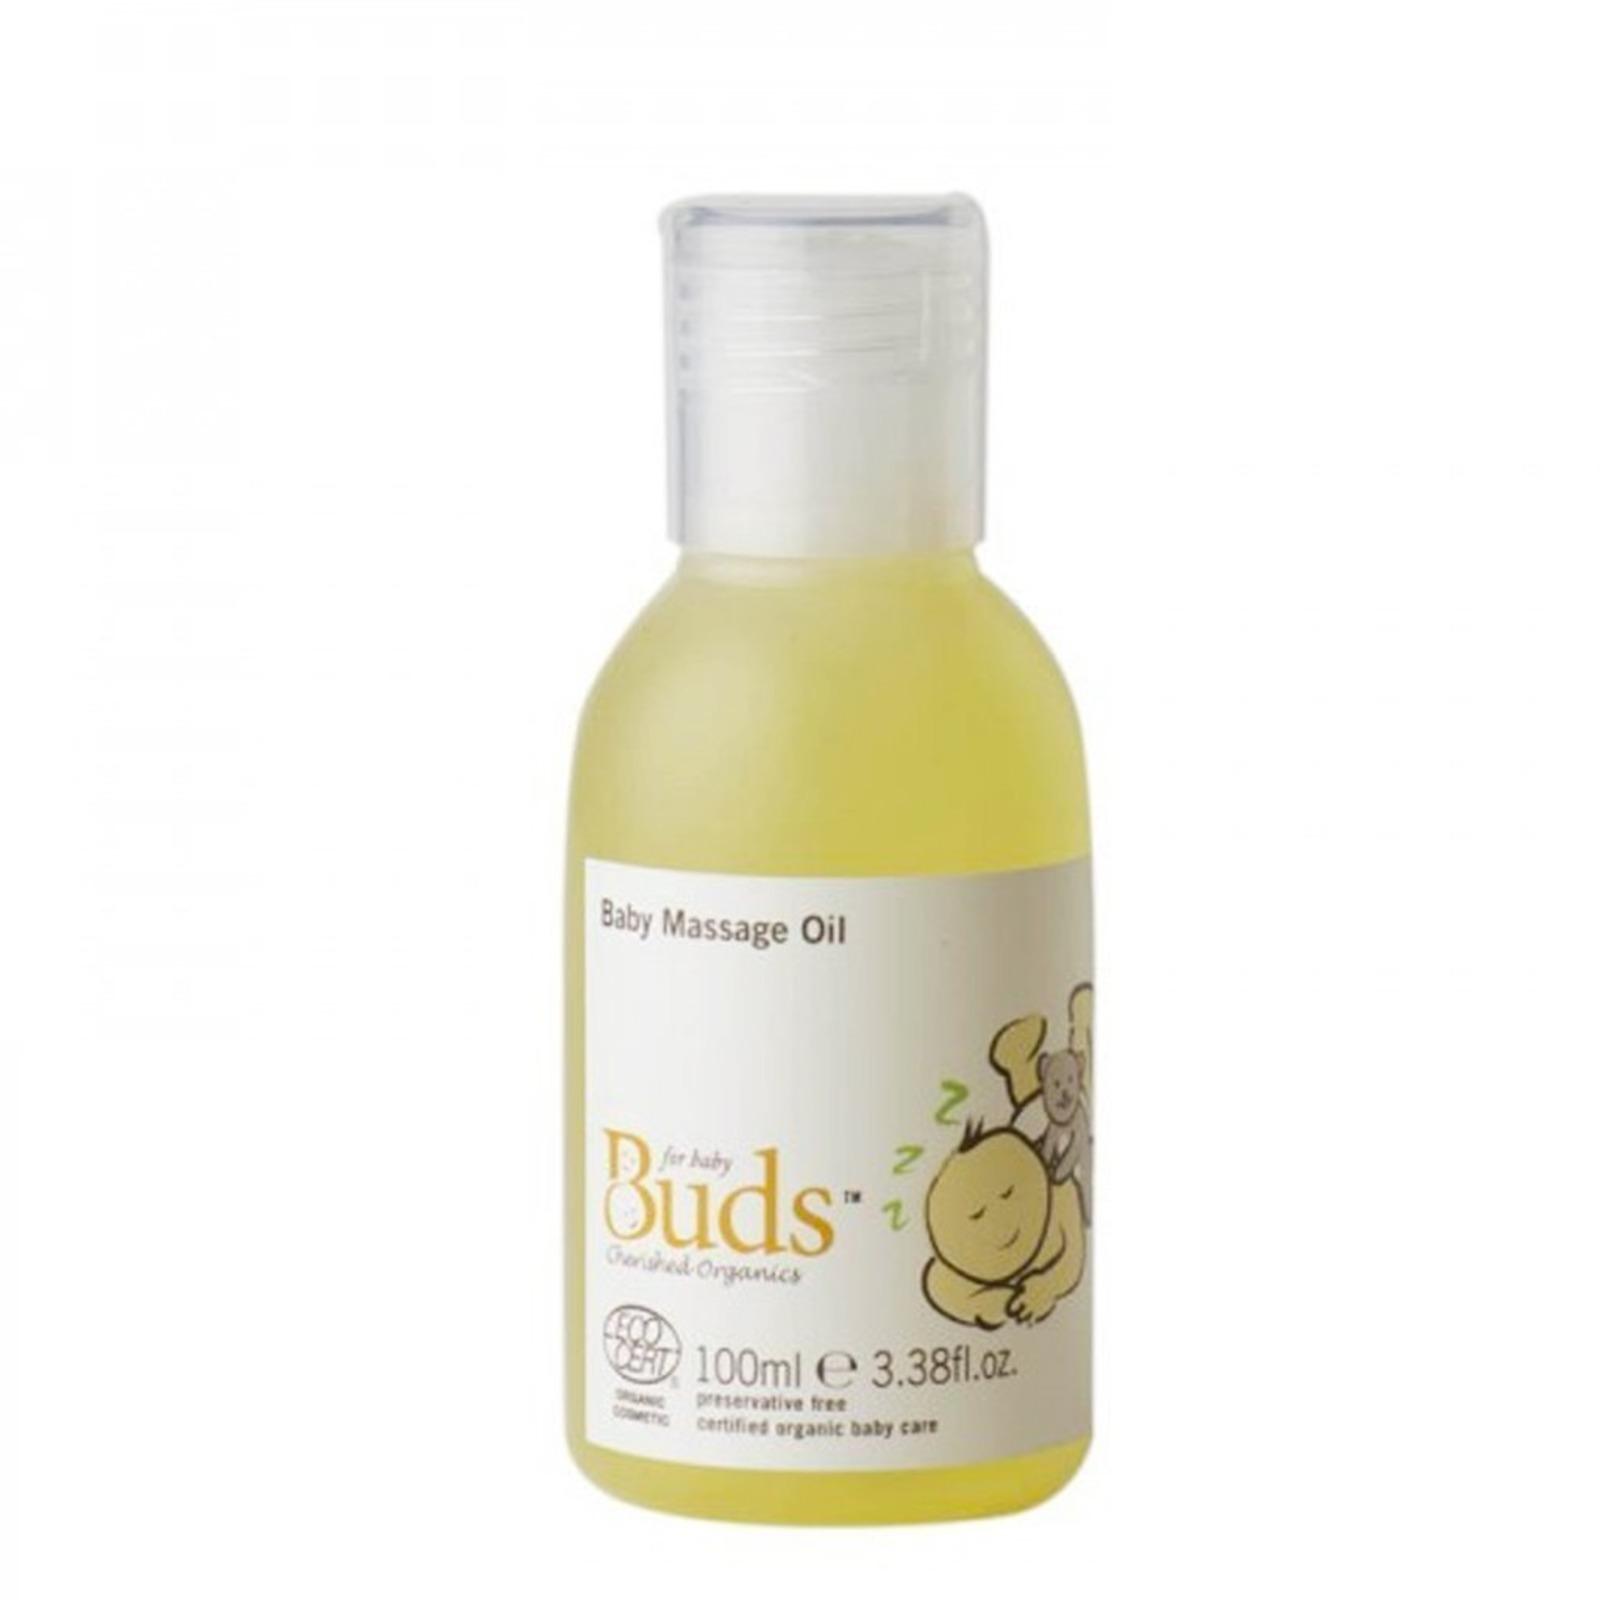 Buds Organics BCO Baby Massage Oil